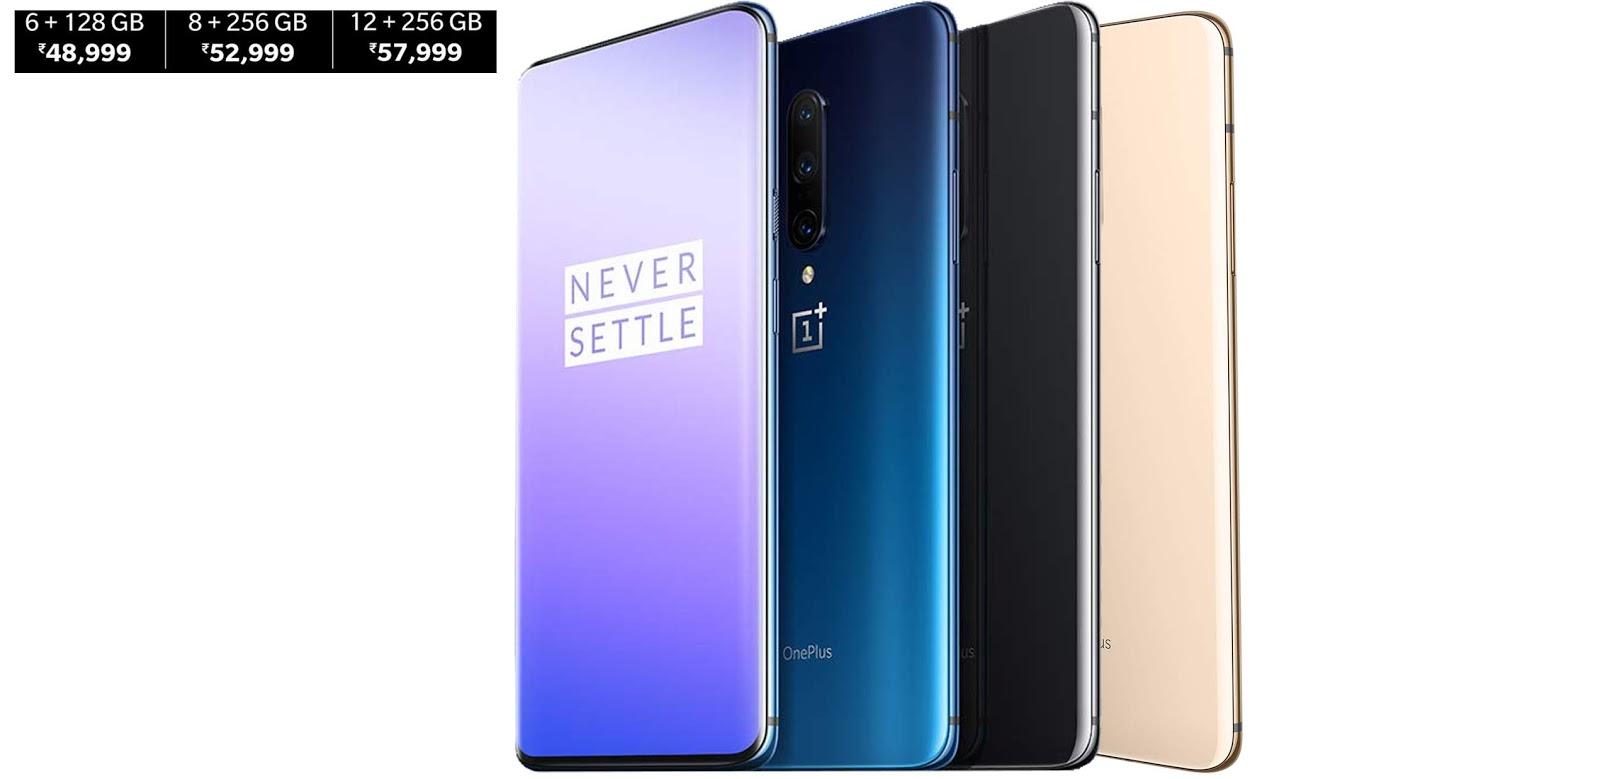 OnePlus 7Pro Smartphone (2019) | Review, Specs, Price, Image